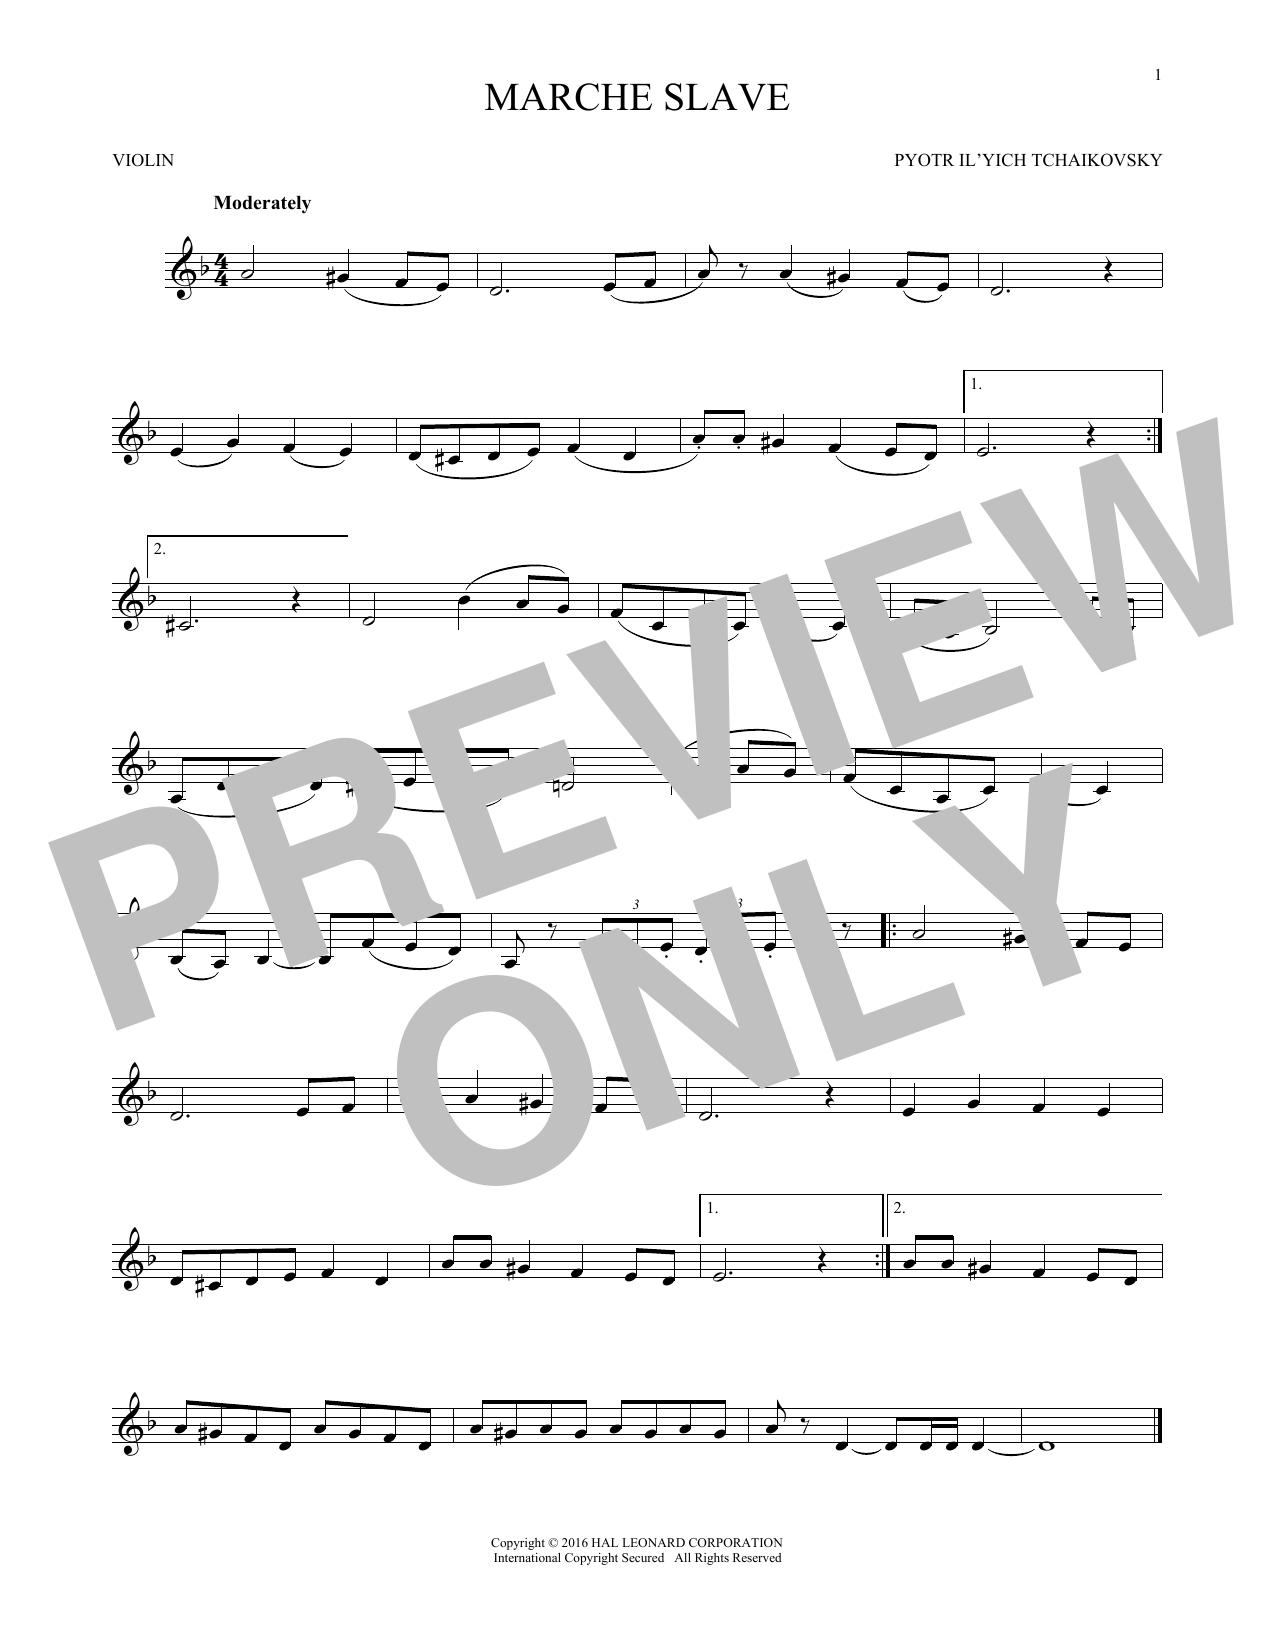 Marche Slav, Op. 31 (Violin Solo)